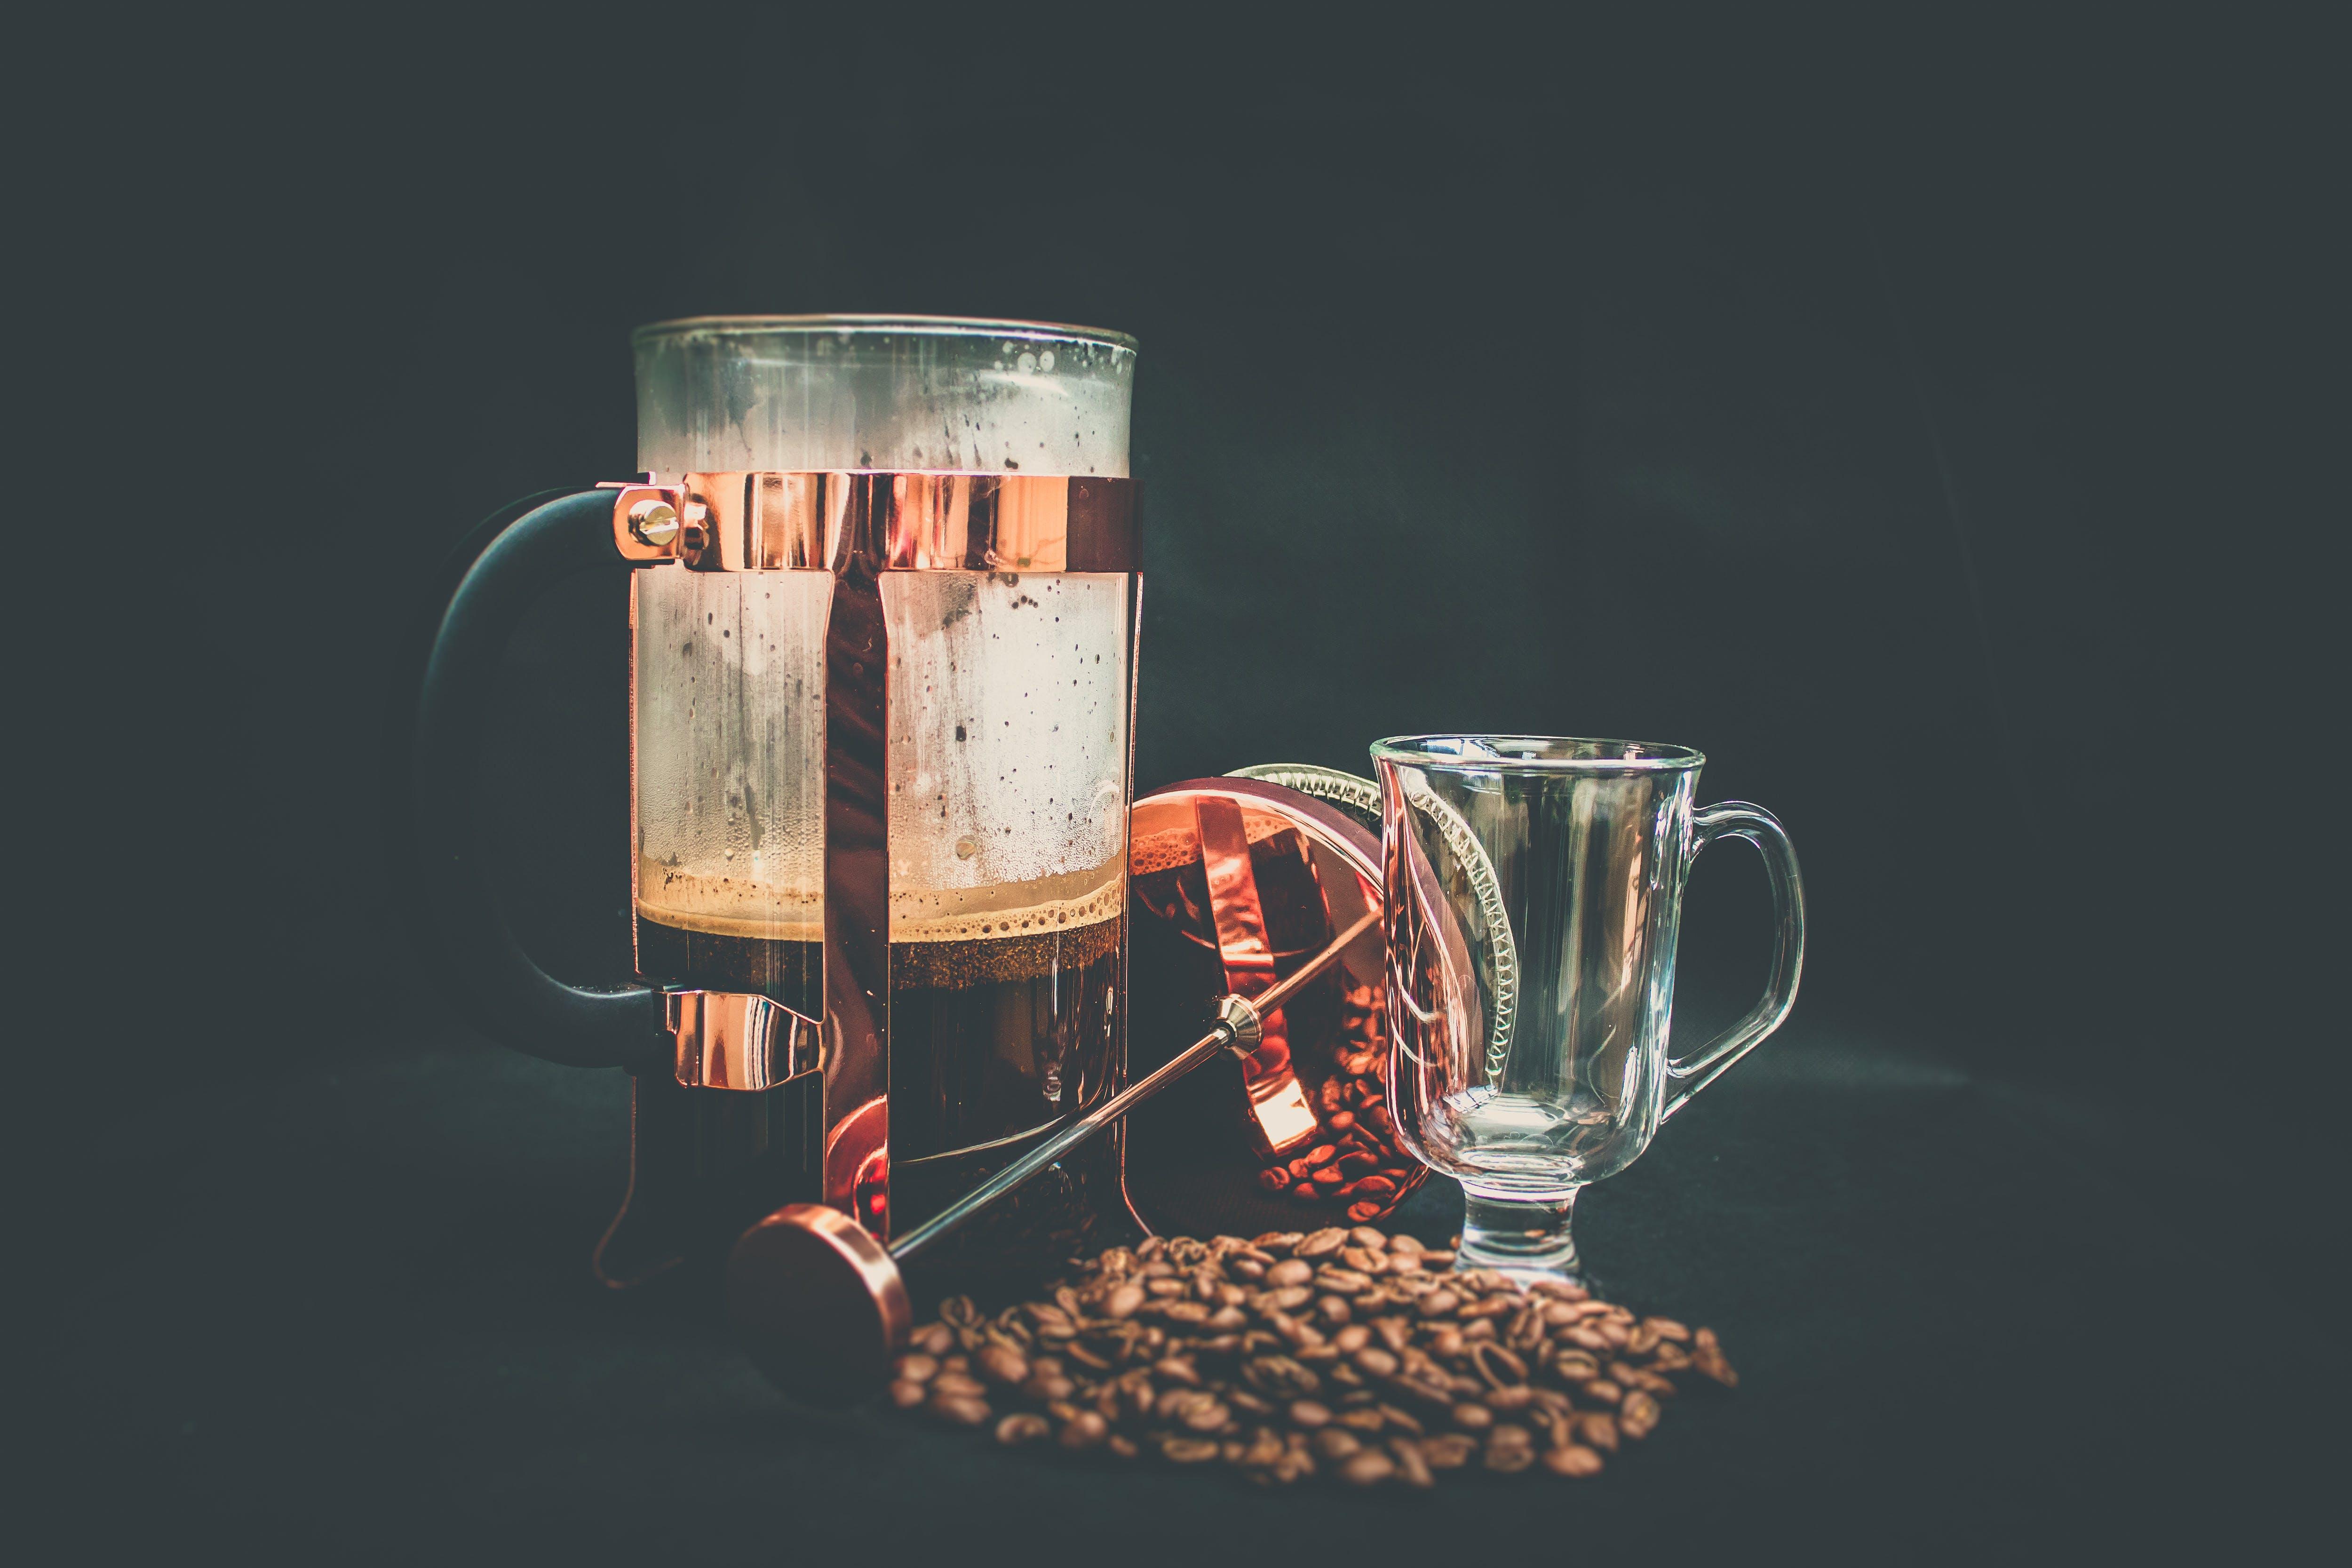 Kostenloses Stock Foto zu gebrühter kaffee, kaffee, kaffee trinken, kaffeebohnen